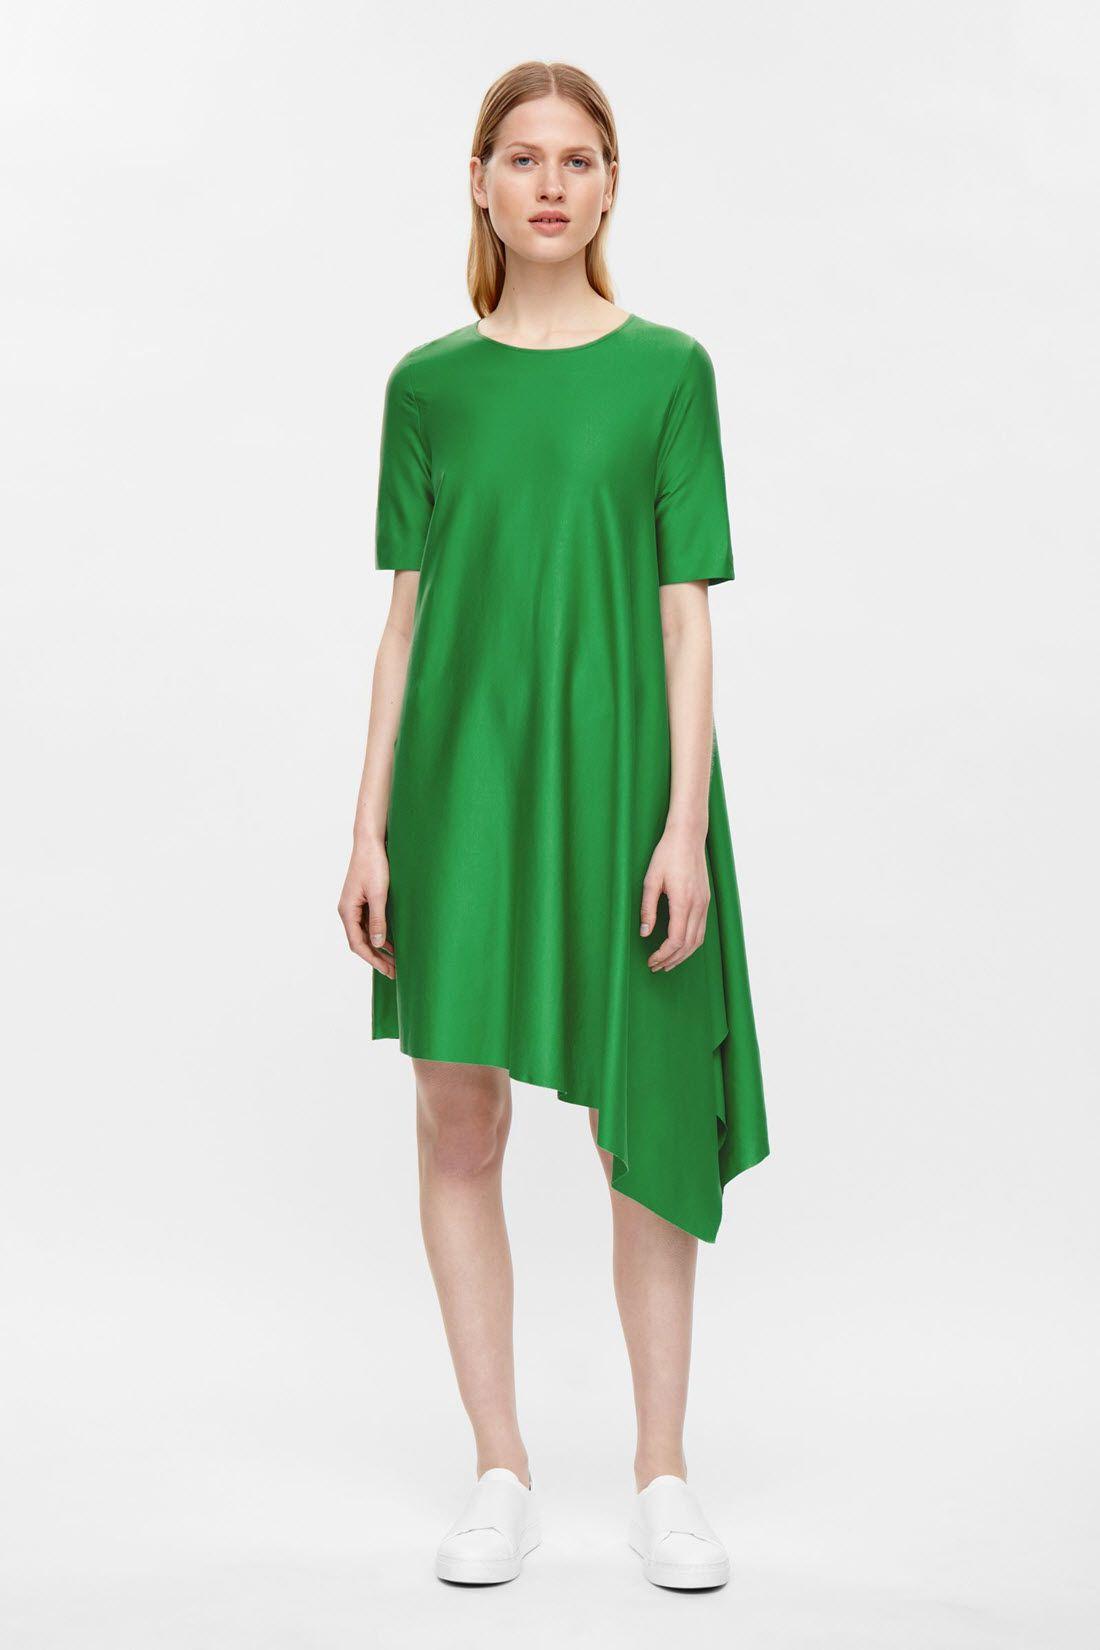 J Jill Wearever Tie Front Dress Celebrity Dresses Dresses Summer Dresses [ 1692 x 1128 Pixel ]